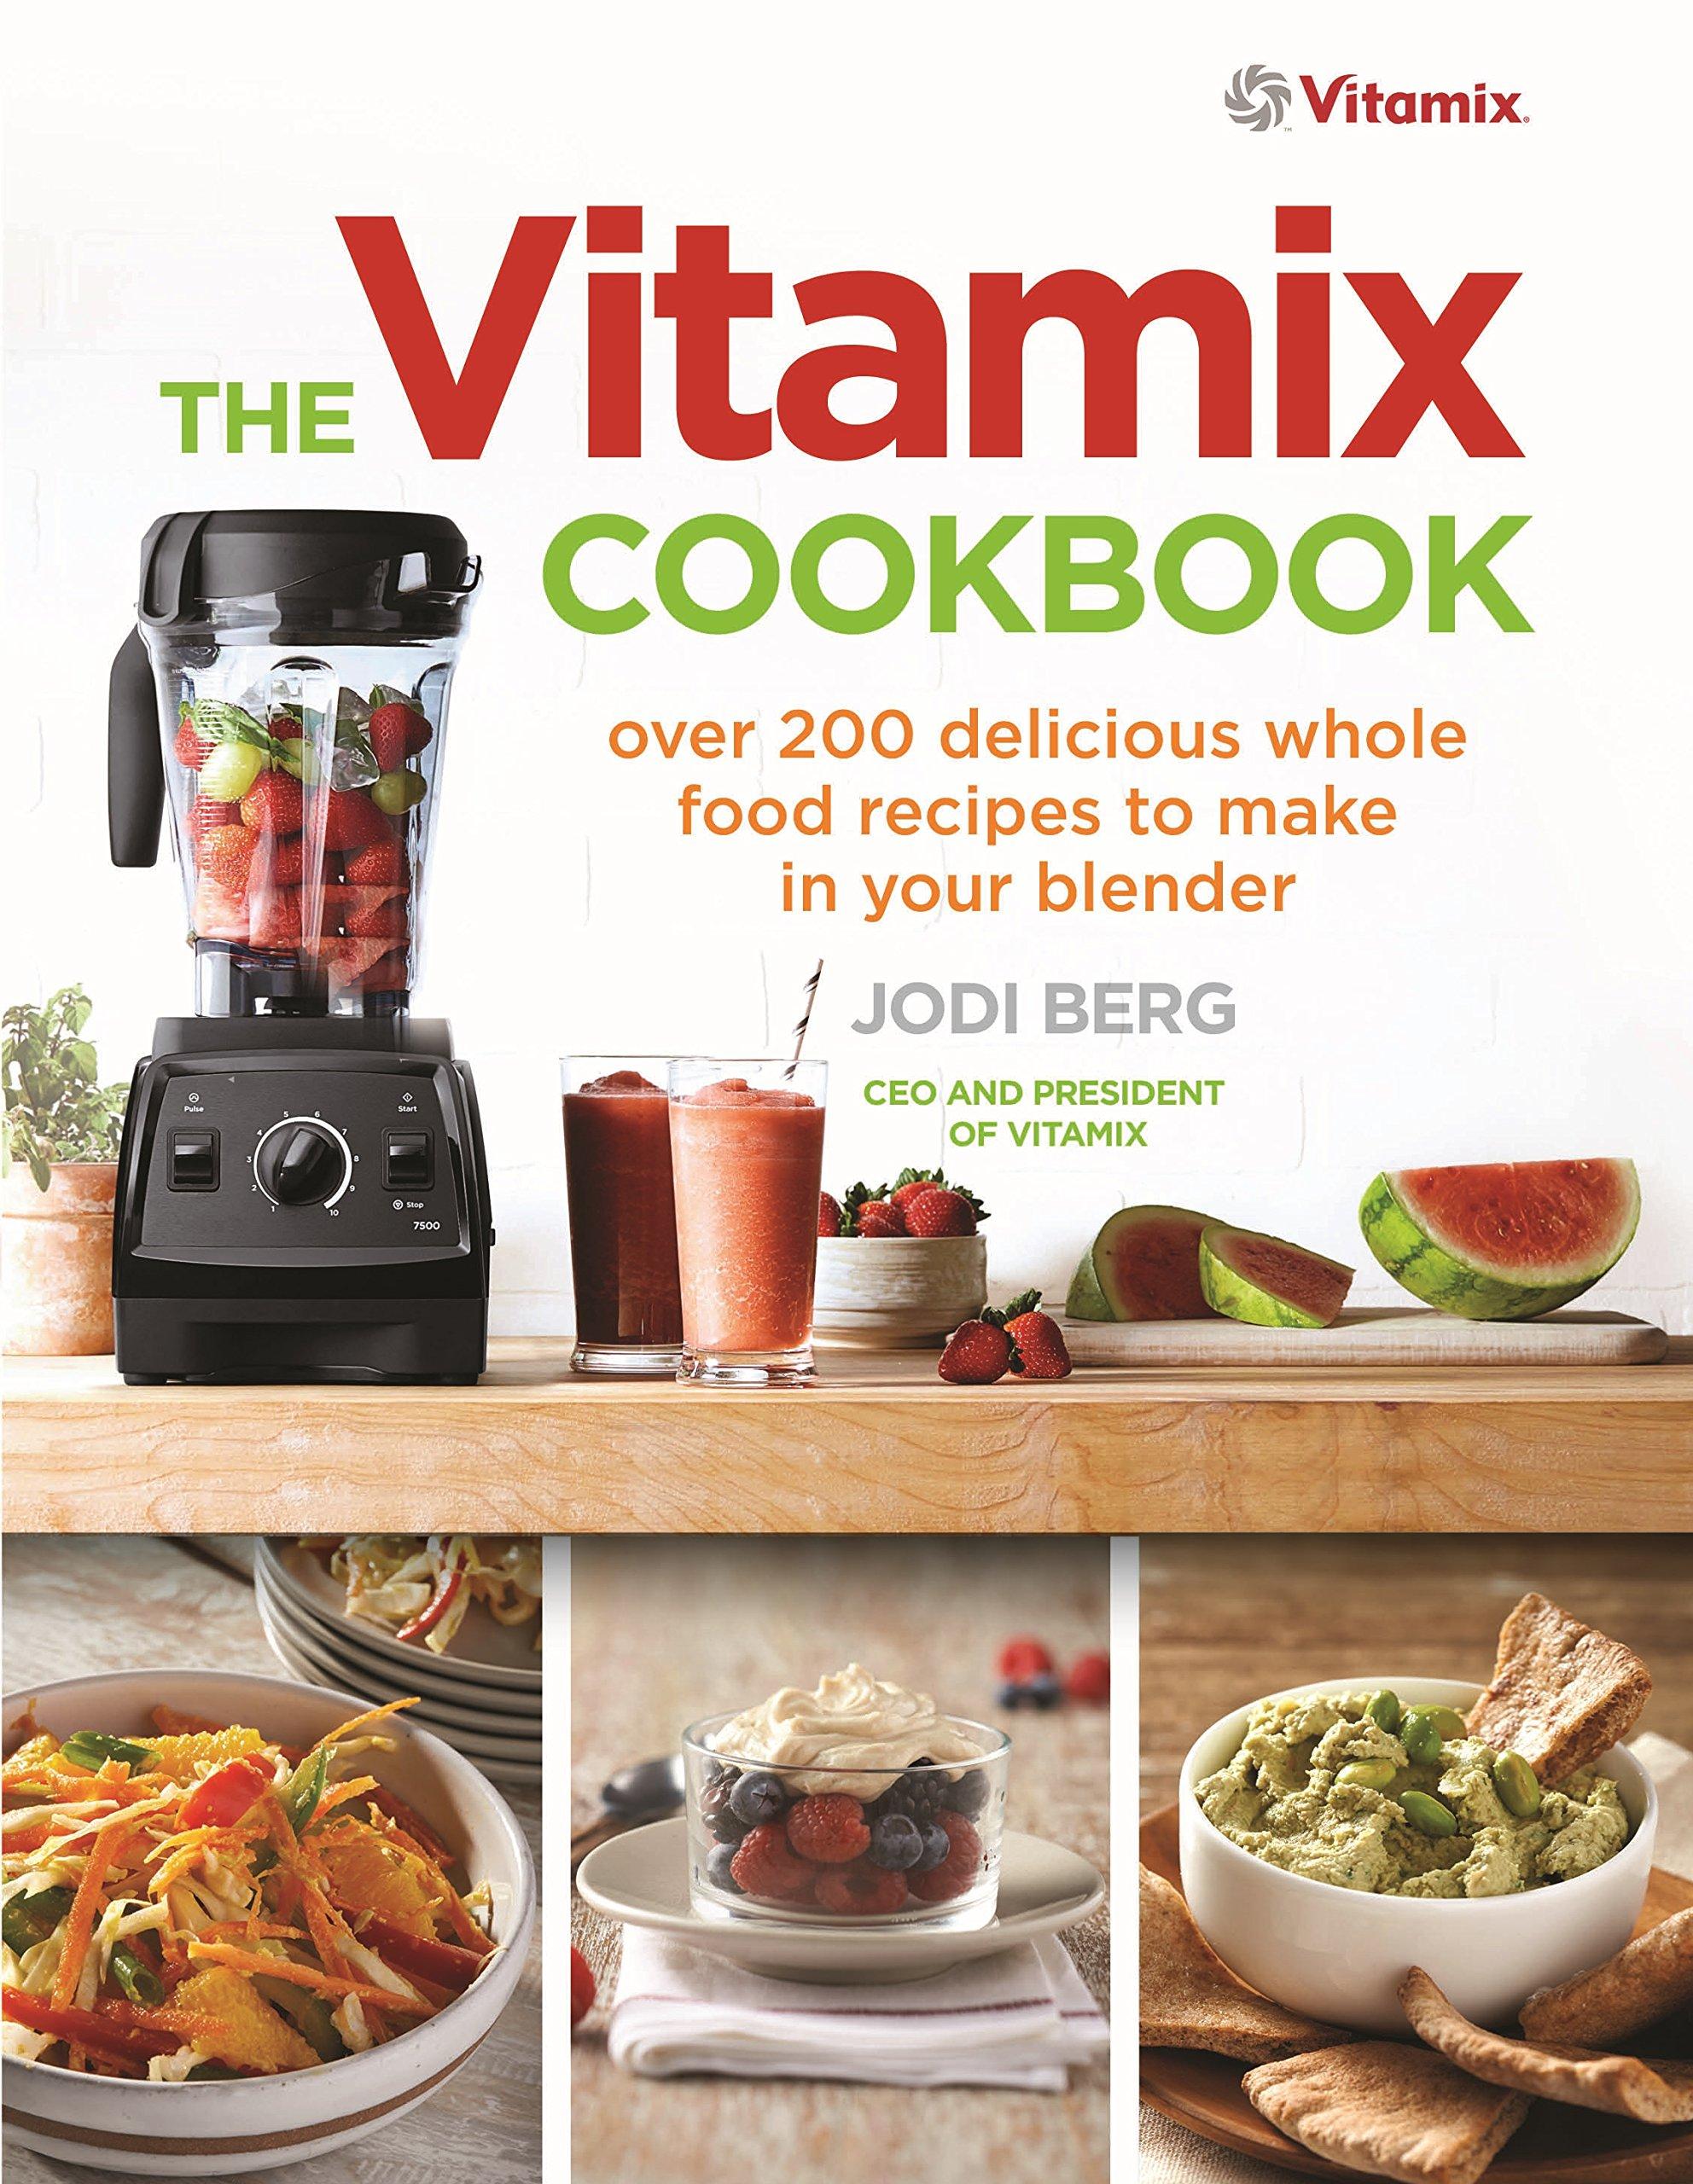 The vitamix cookbook over 200 delicious whole food recipes to the vitamix cookbook over 200 delicious whole food recipes to make in your blender amazon jodi berg 9781785040375 books forumfinder Gallery